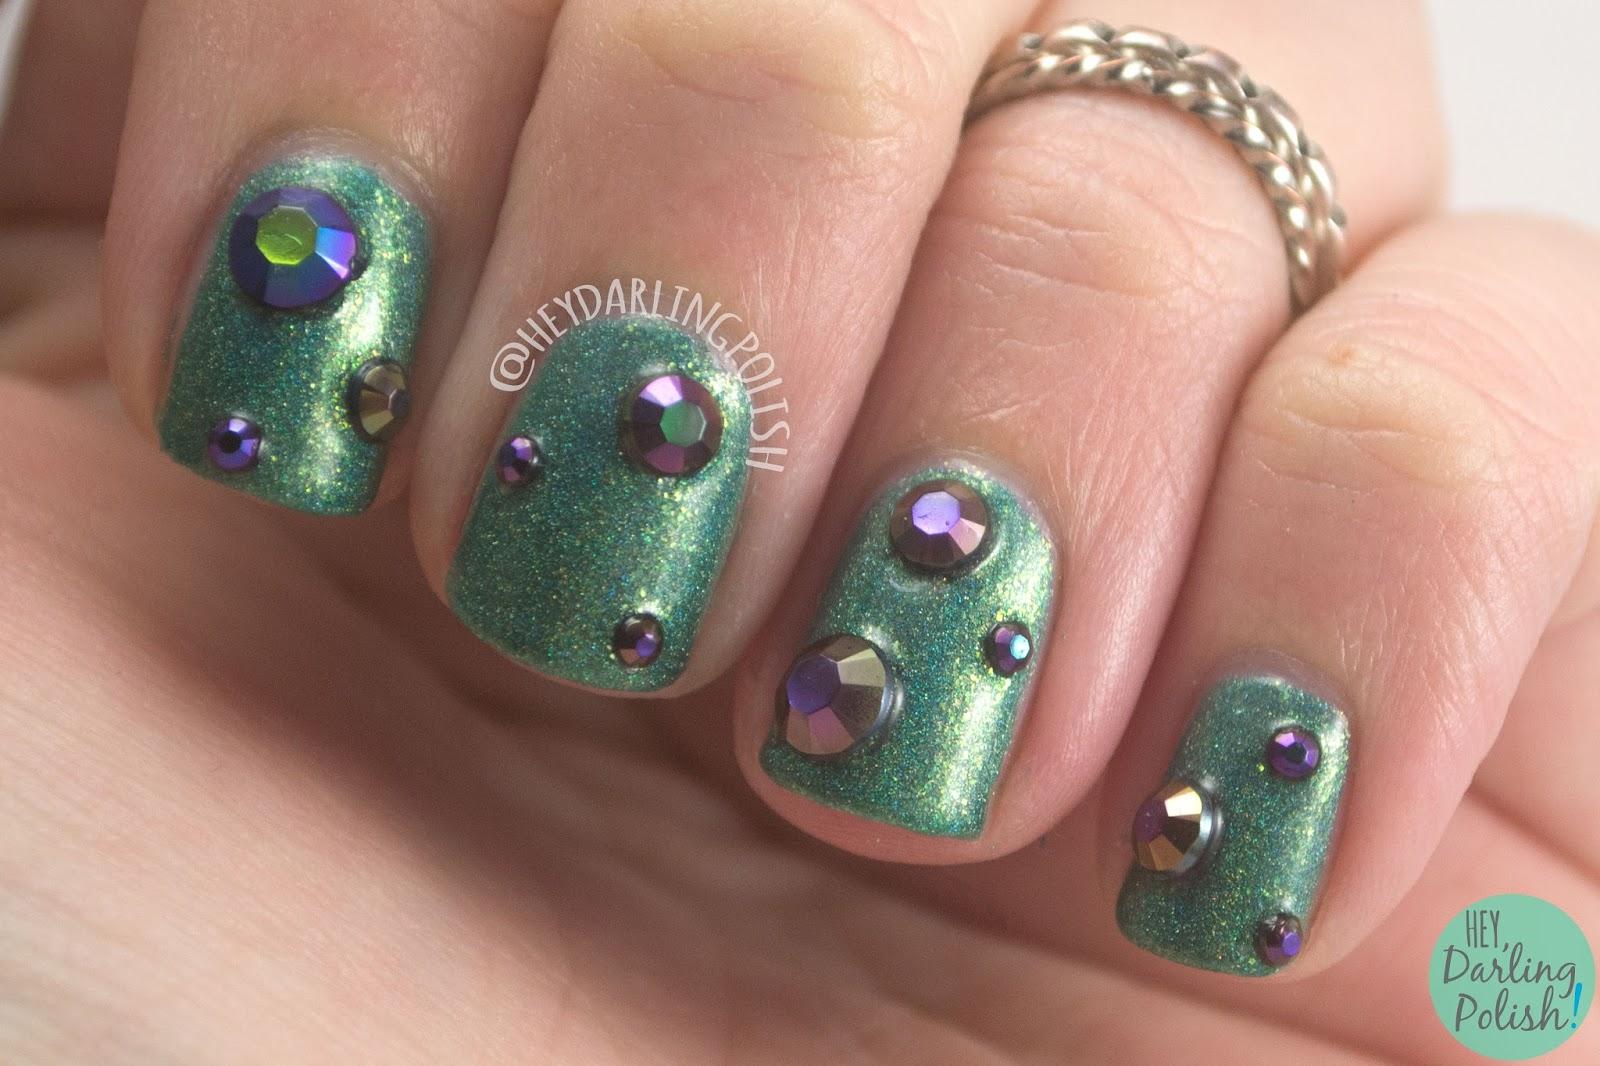 nails, nail art, nail polish, lynbdesigns, born pretty store, rhinestones, holo, hey darling polish